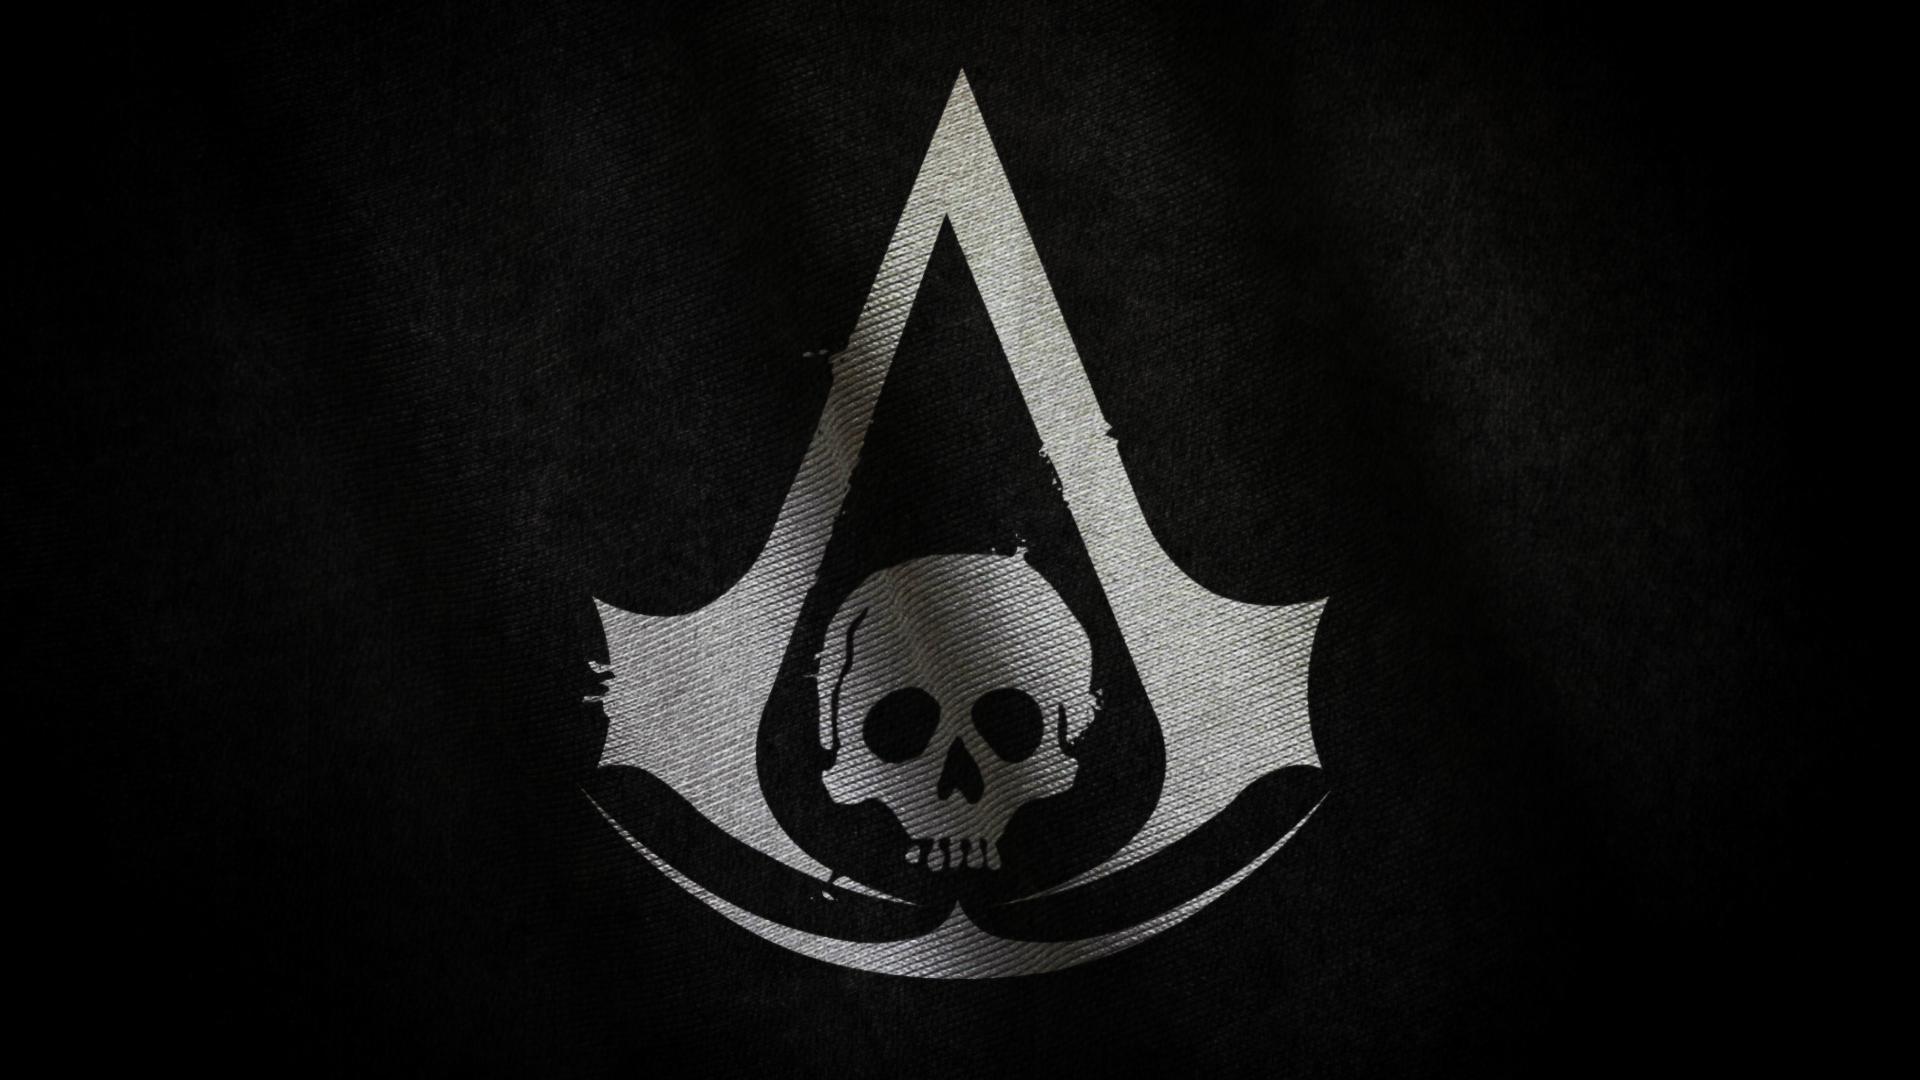 AC4 Black Flag Wallpaper